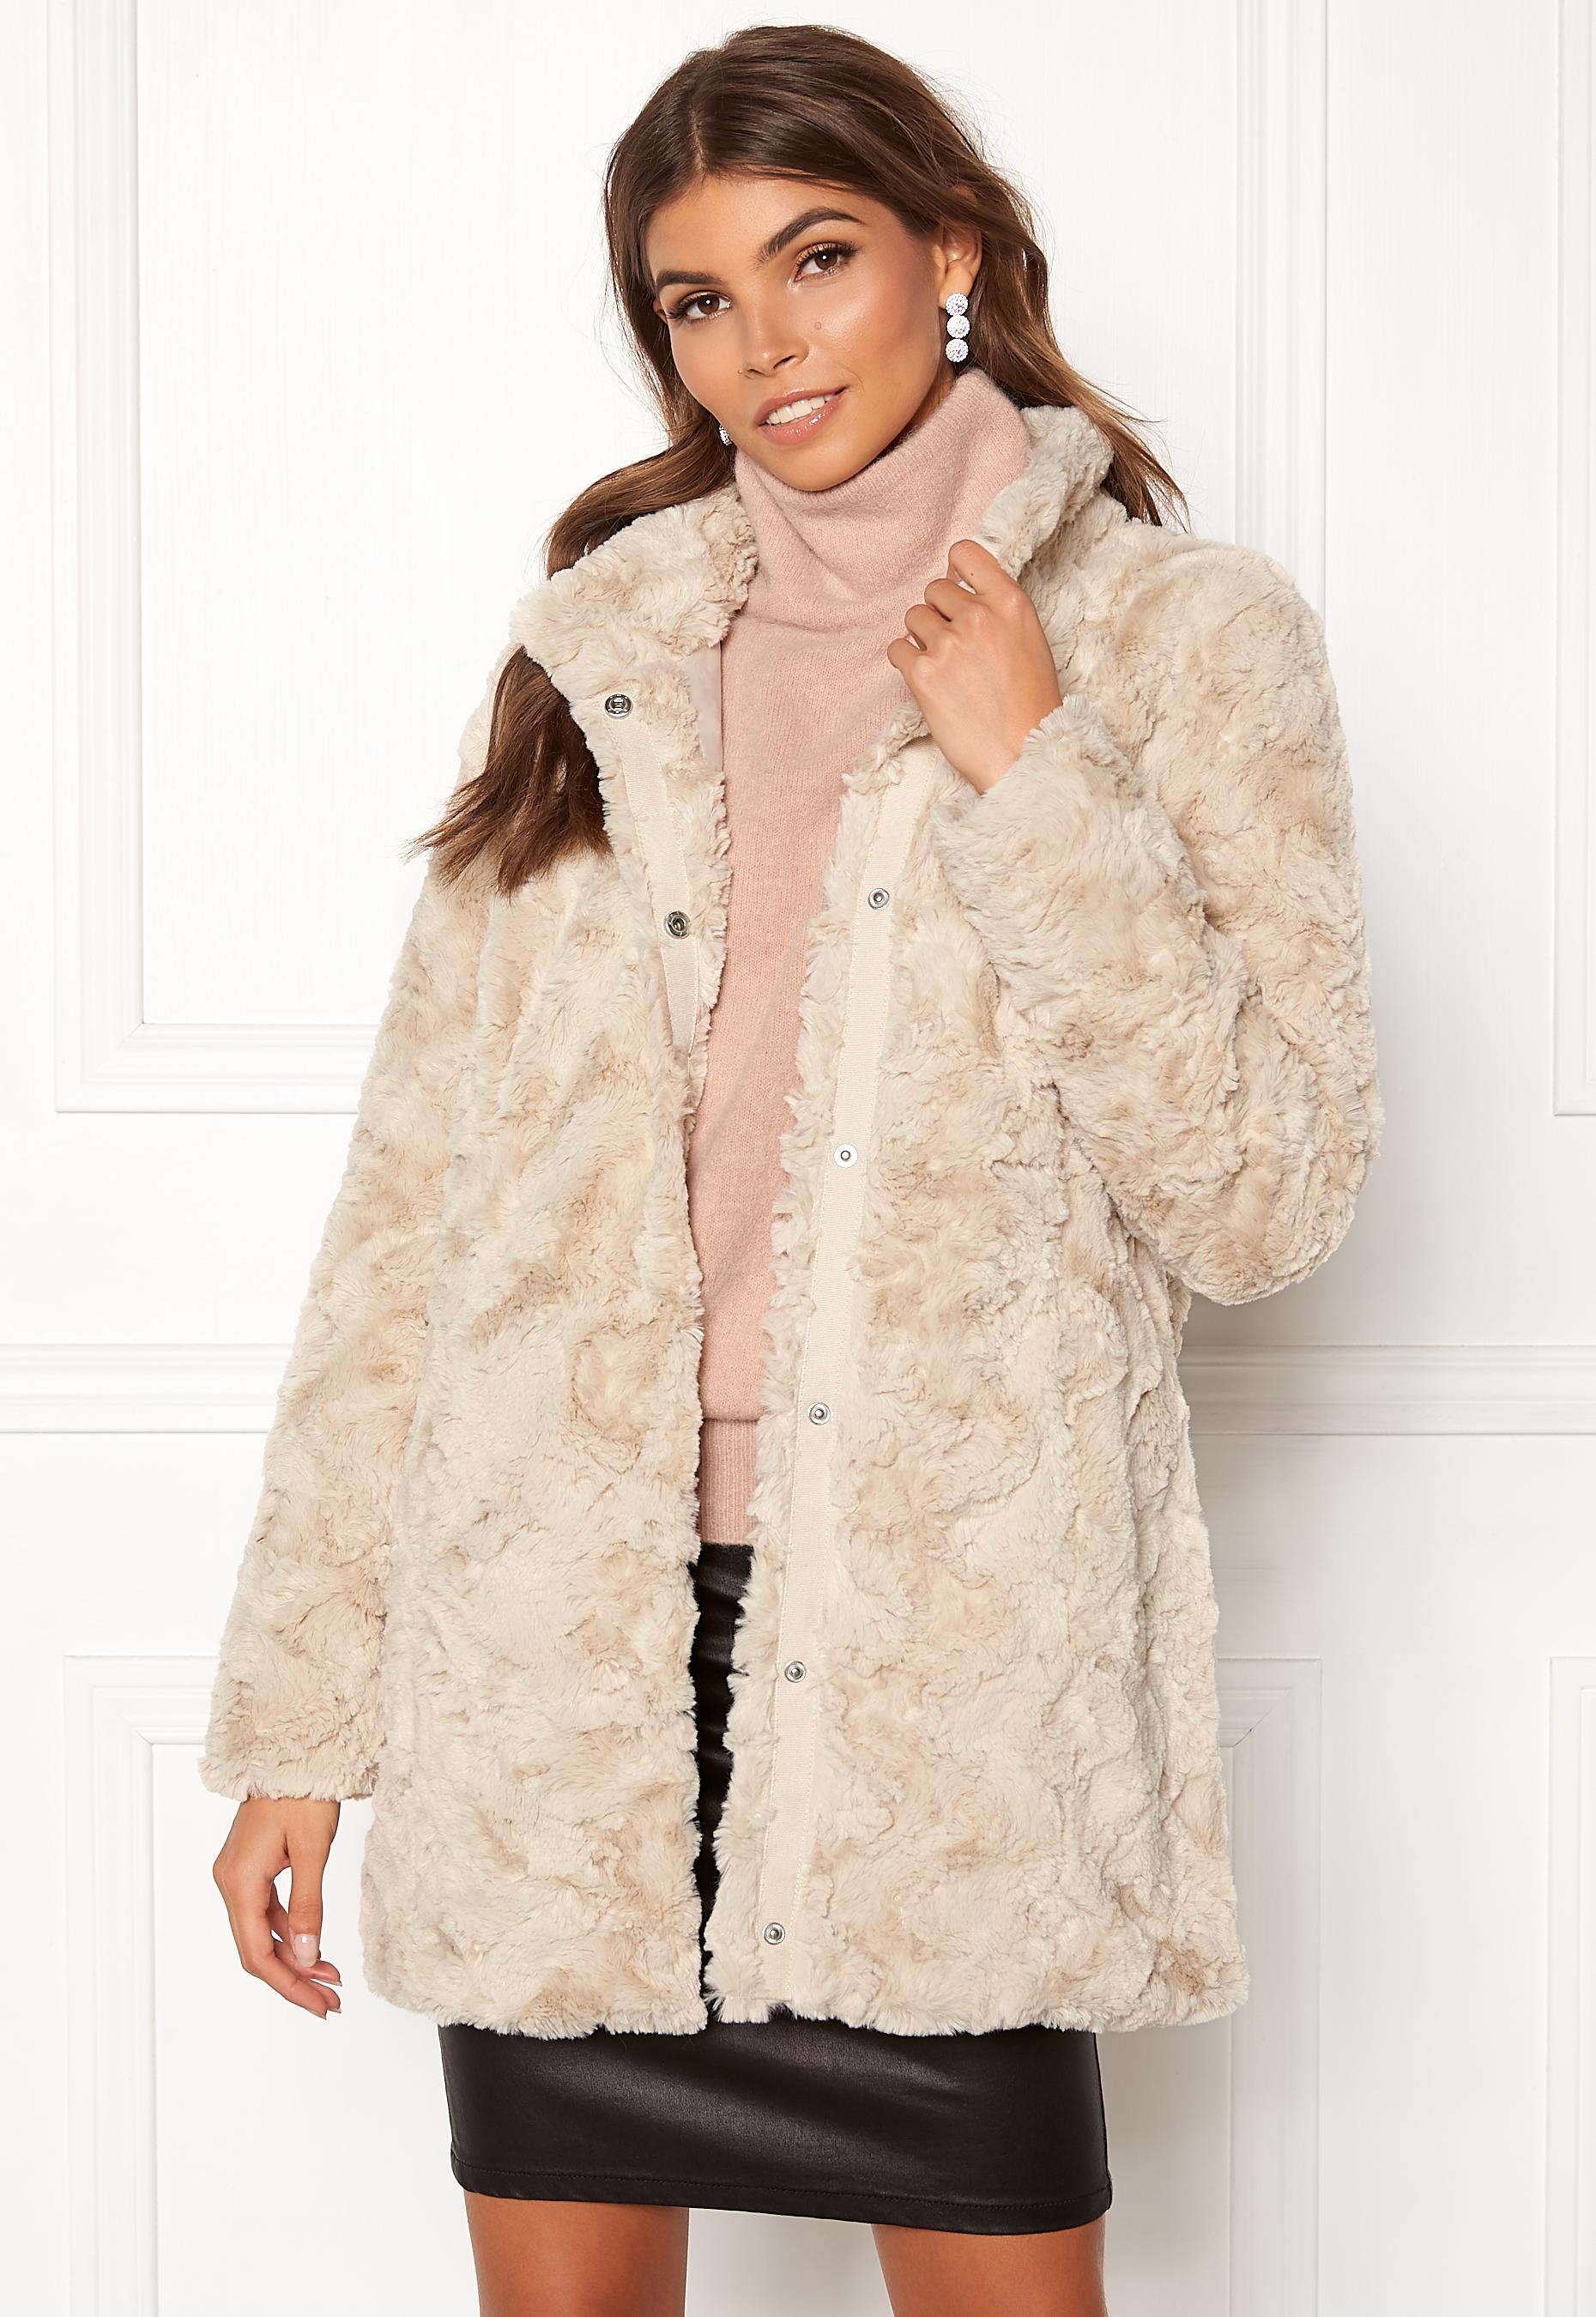 VERO MODA Curl Faux Fur Jacket Oatmeal - Bubbleroom 1b7308831475